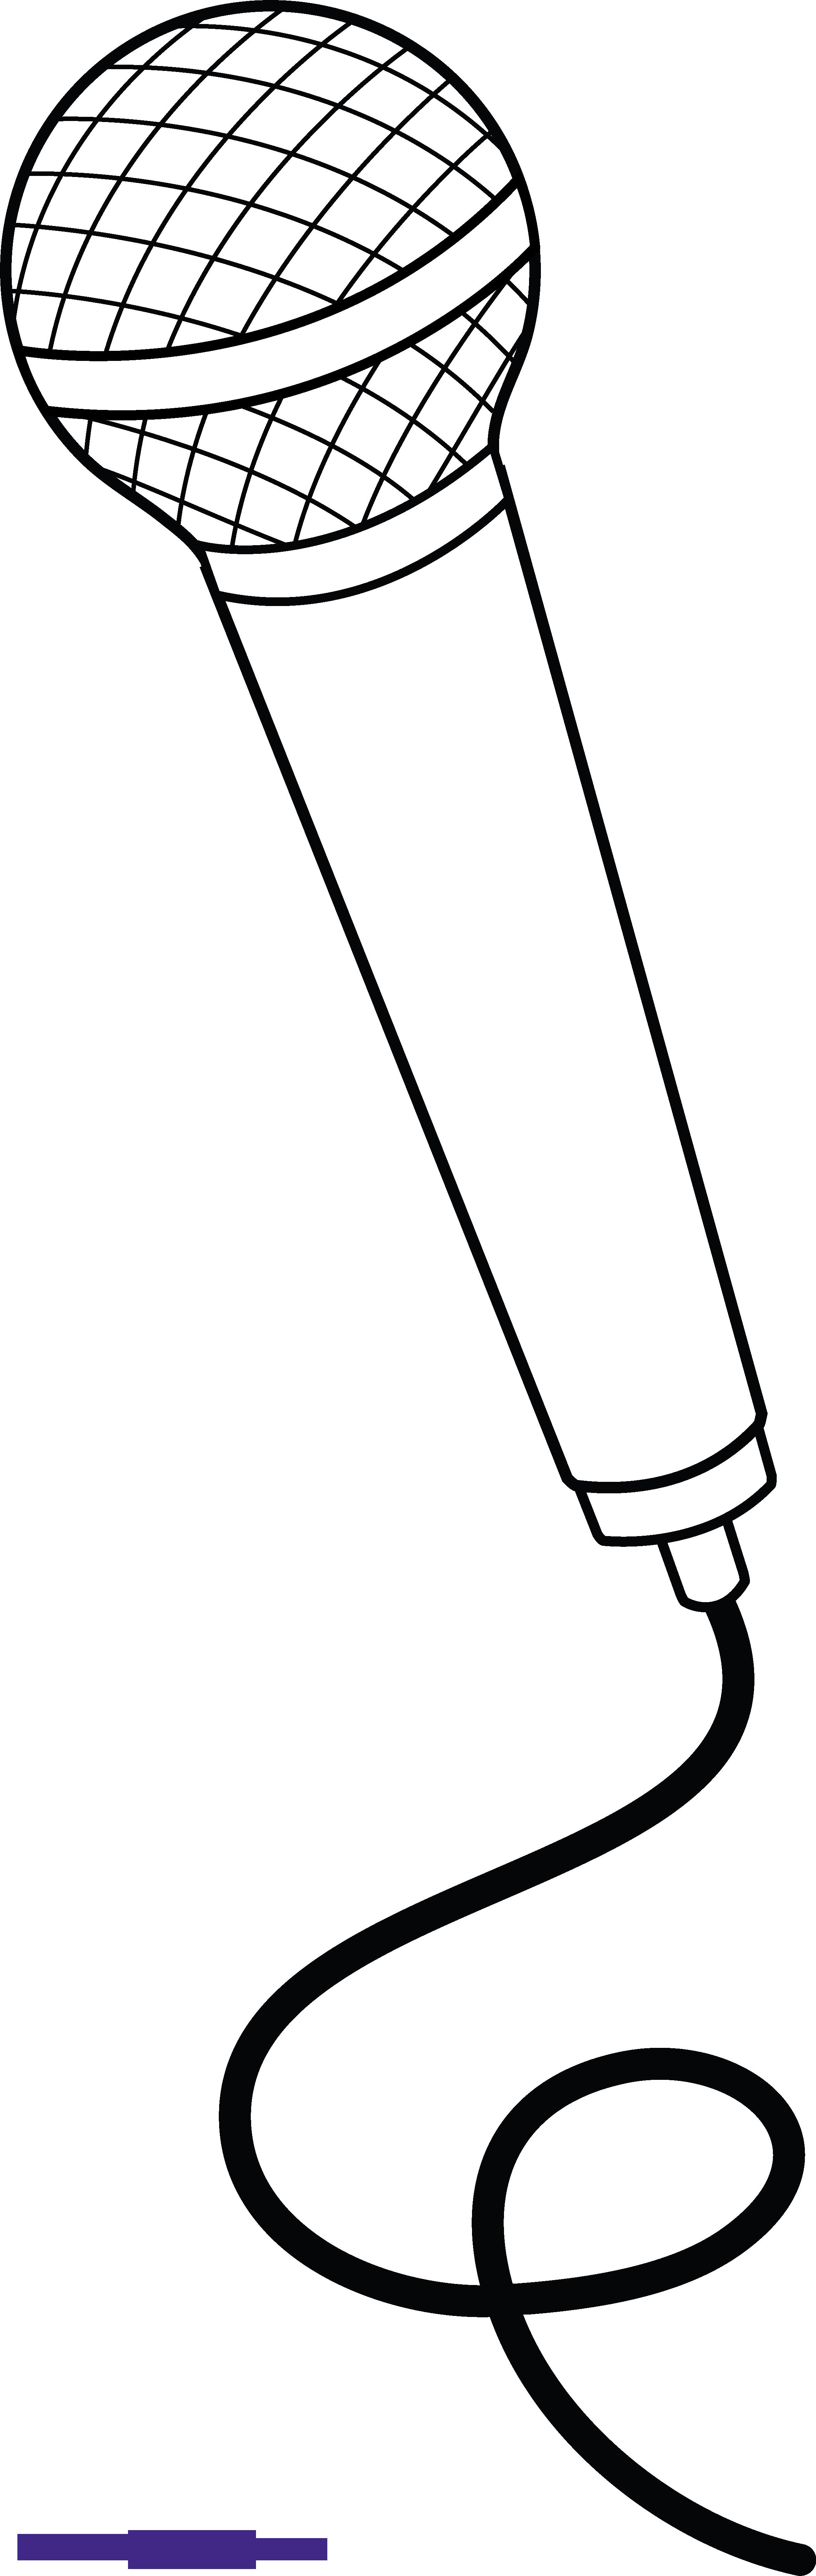 Outline sweet clip art. Microphone clipart tumblr transparent